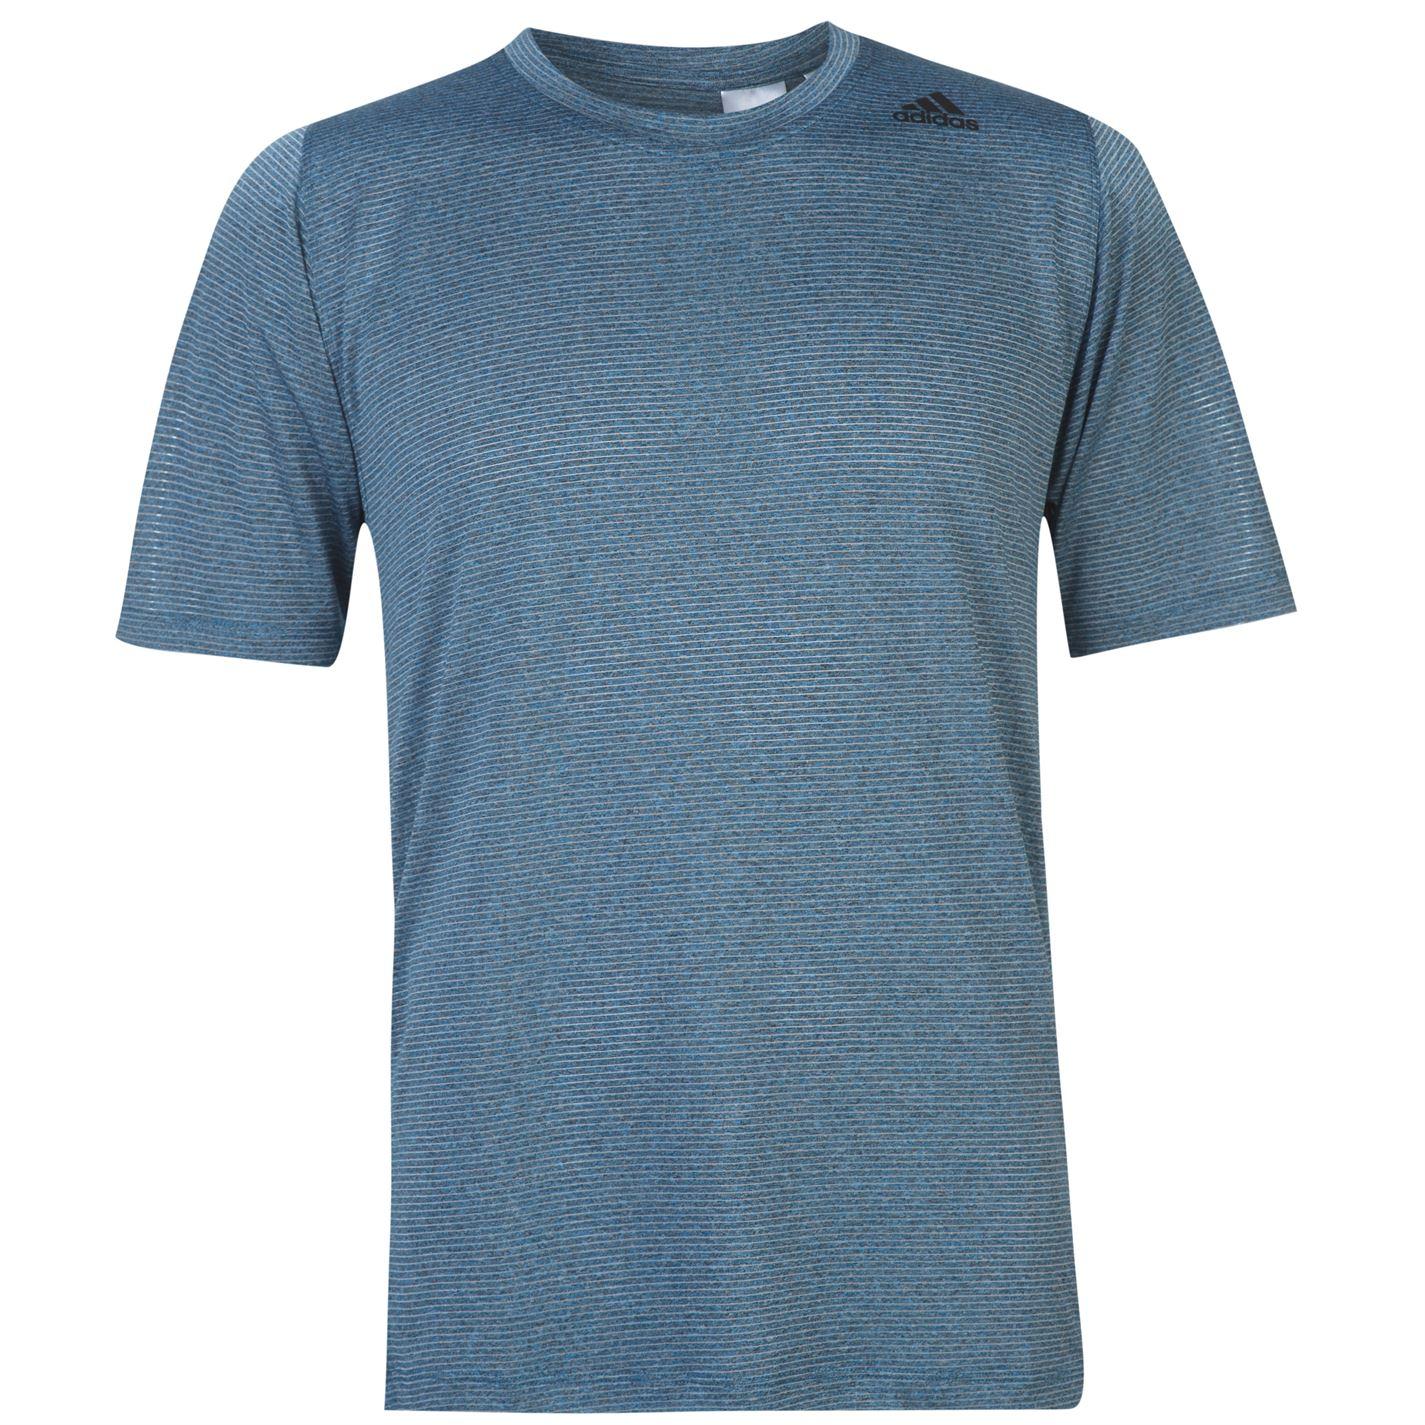 Adidas Tech Fit Training T Shirt Mens